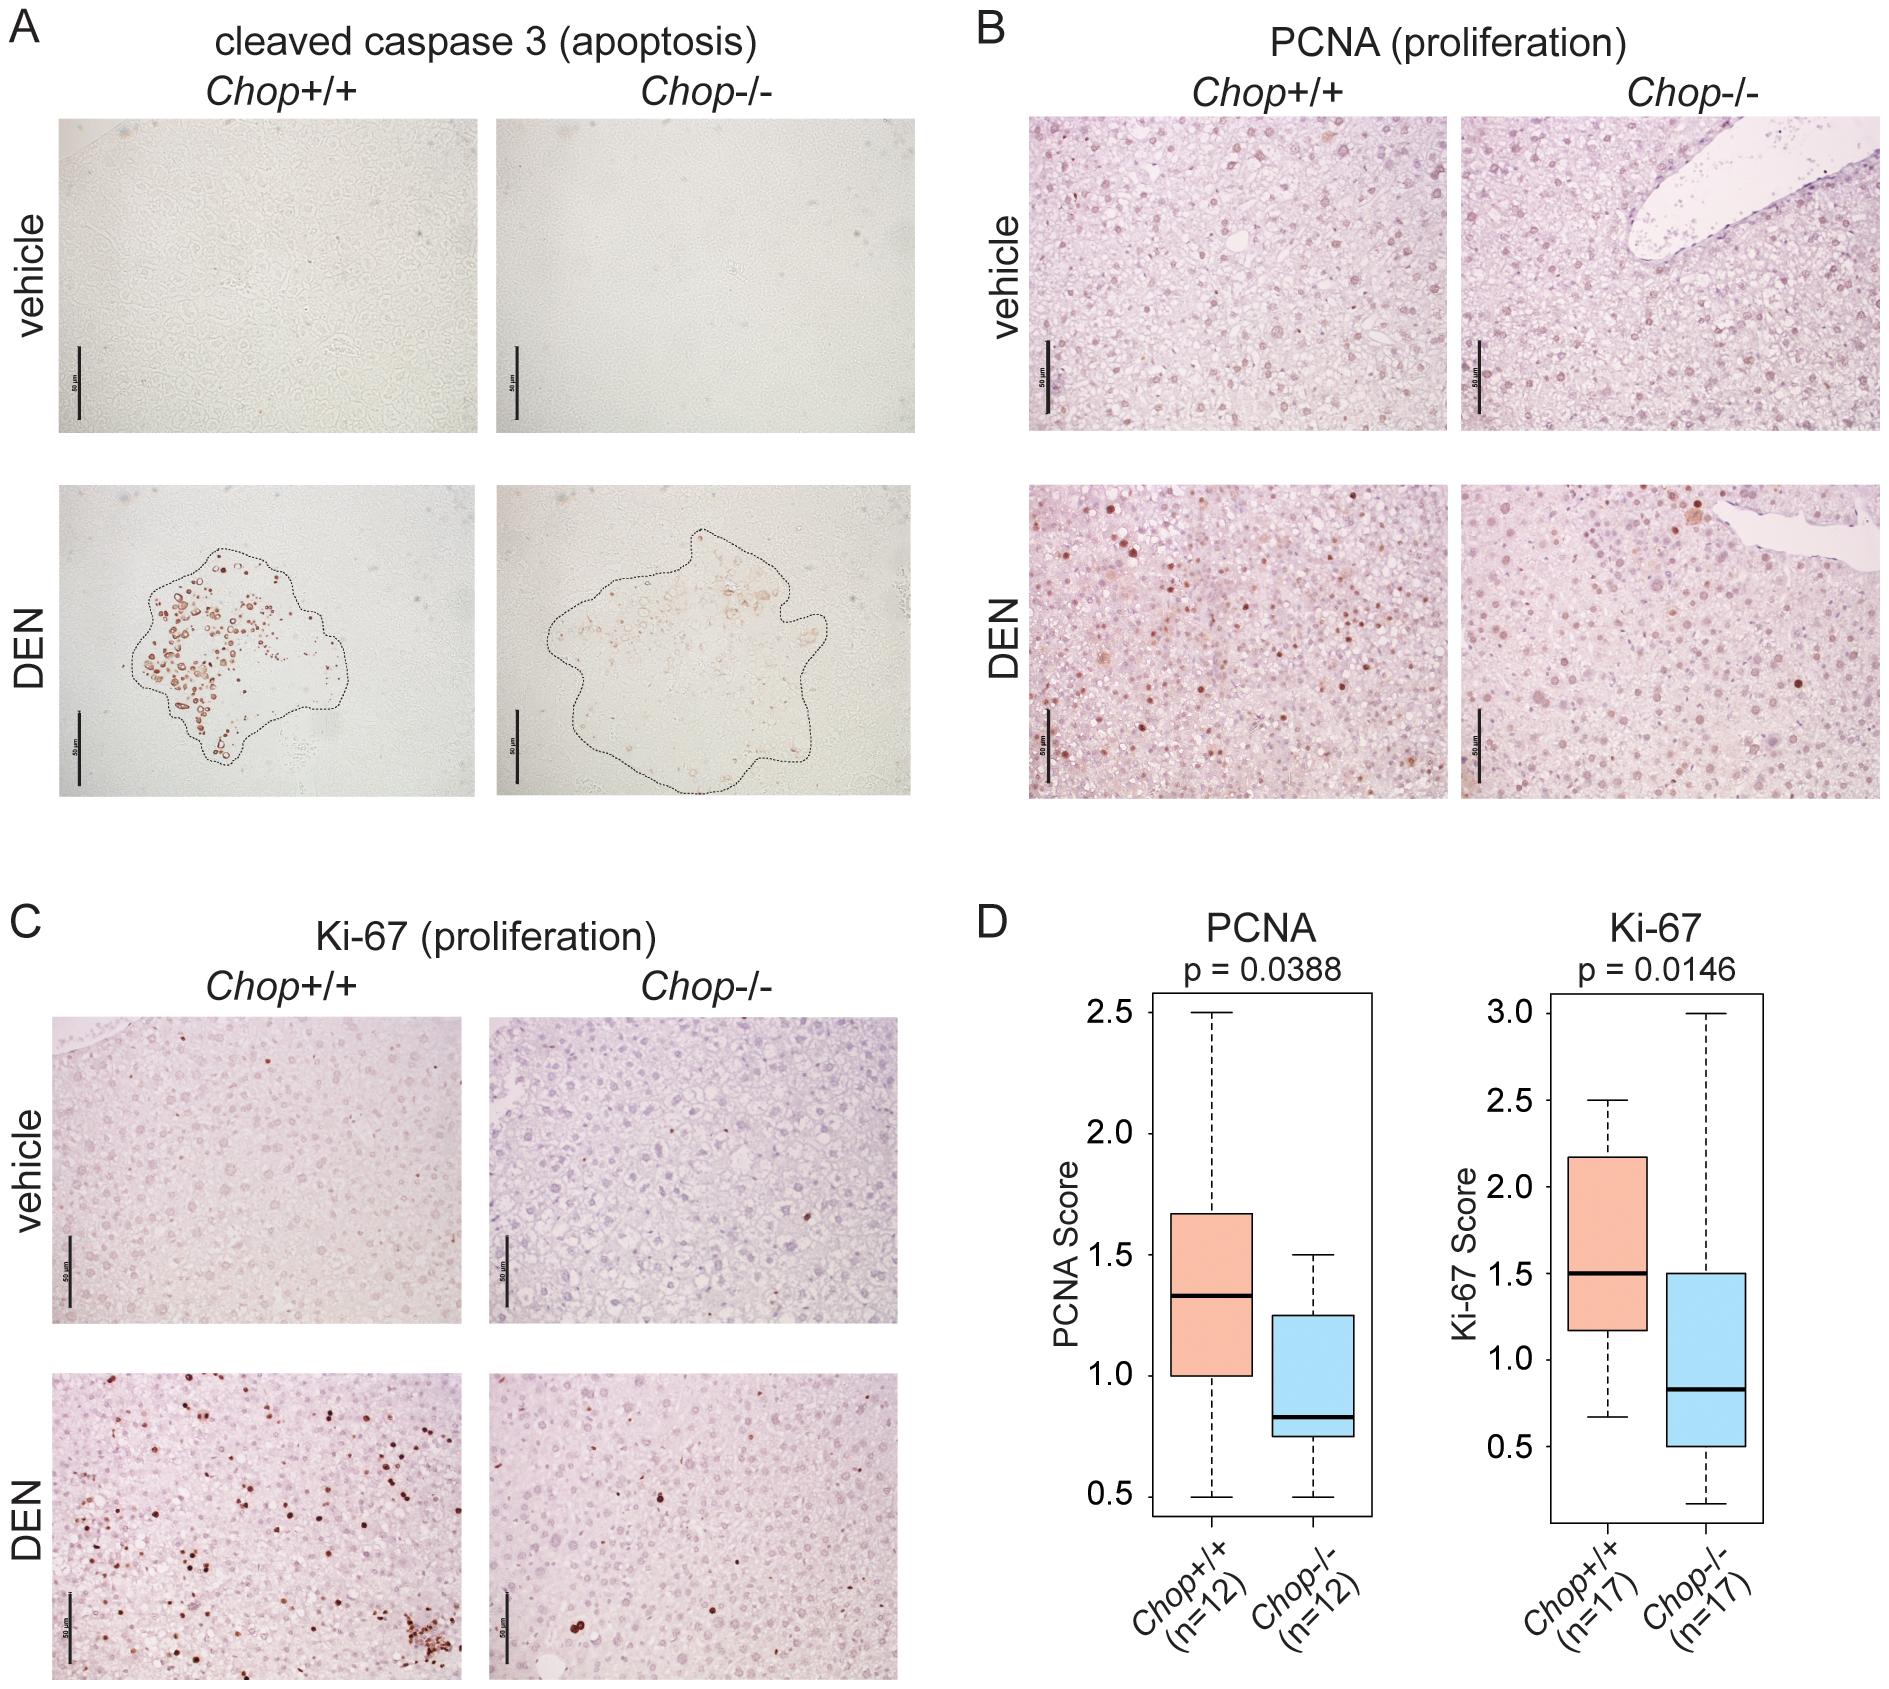 CHOP promotes hepatocellular apoptosis and proliferation.